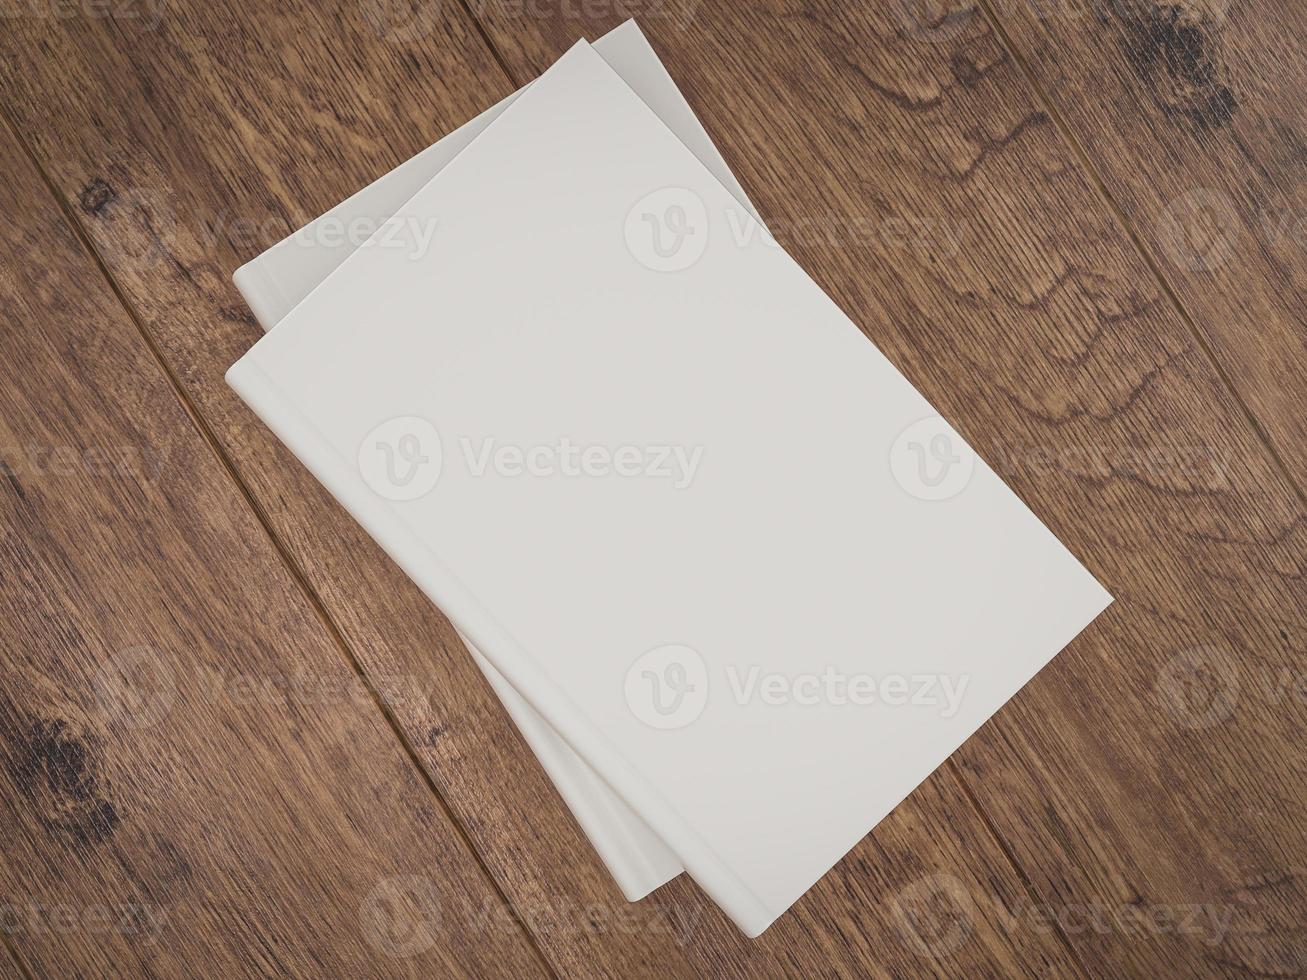 tom vitbokmodellmall på träbakgrund foto